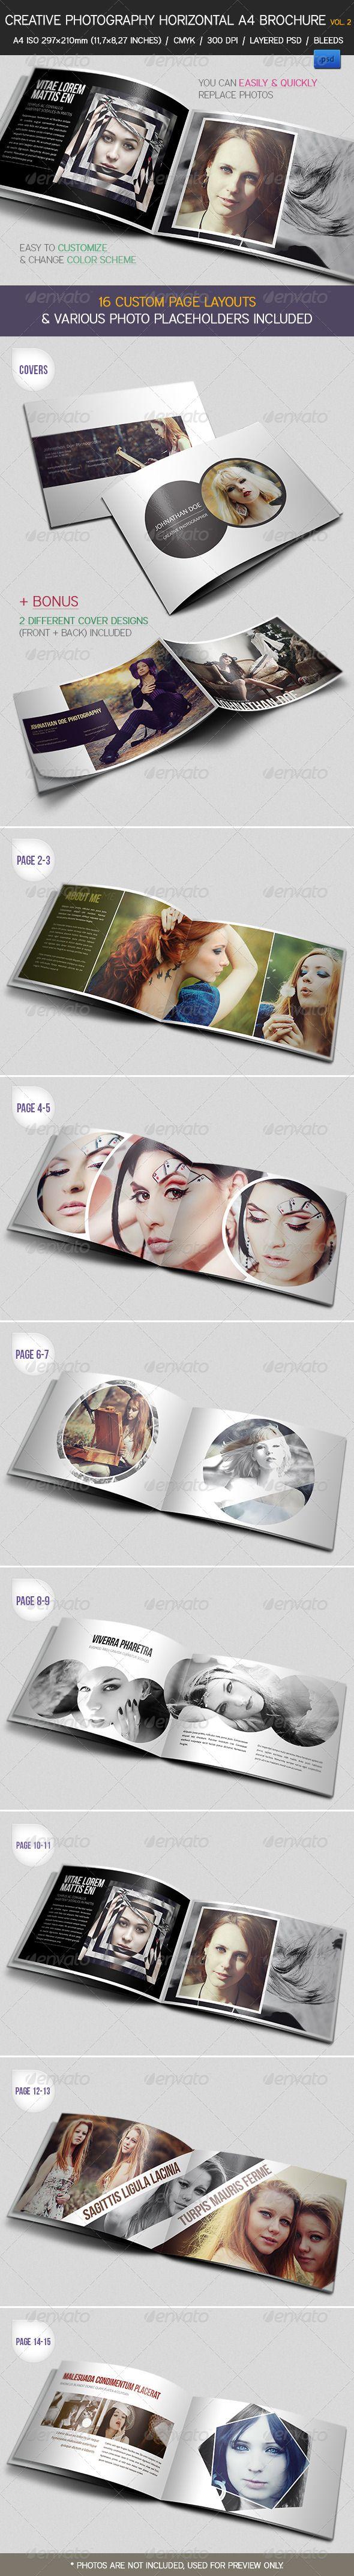 Creative Photography Portfolio A4 Brochure vol. 2 - GraphicRiver Item for Sale